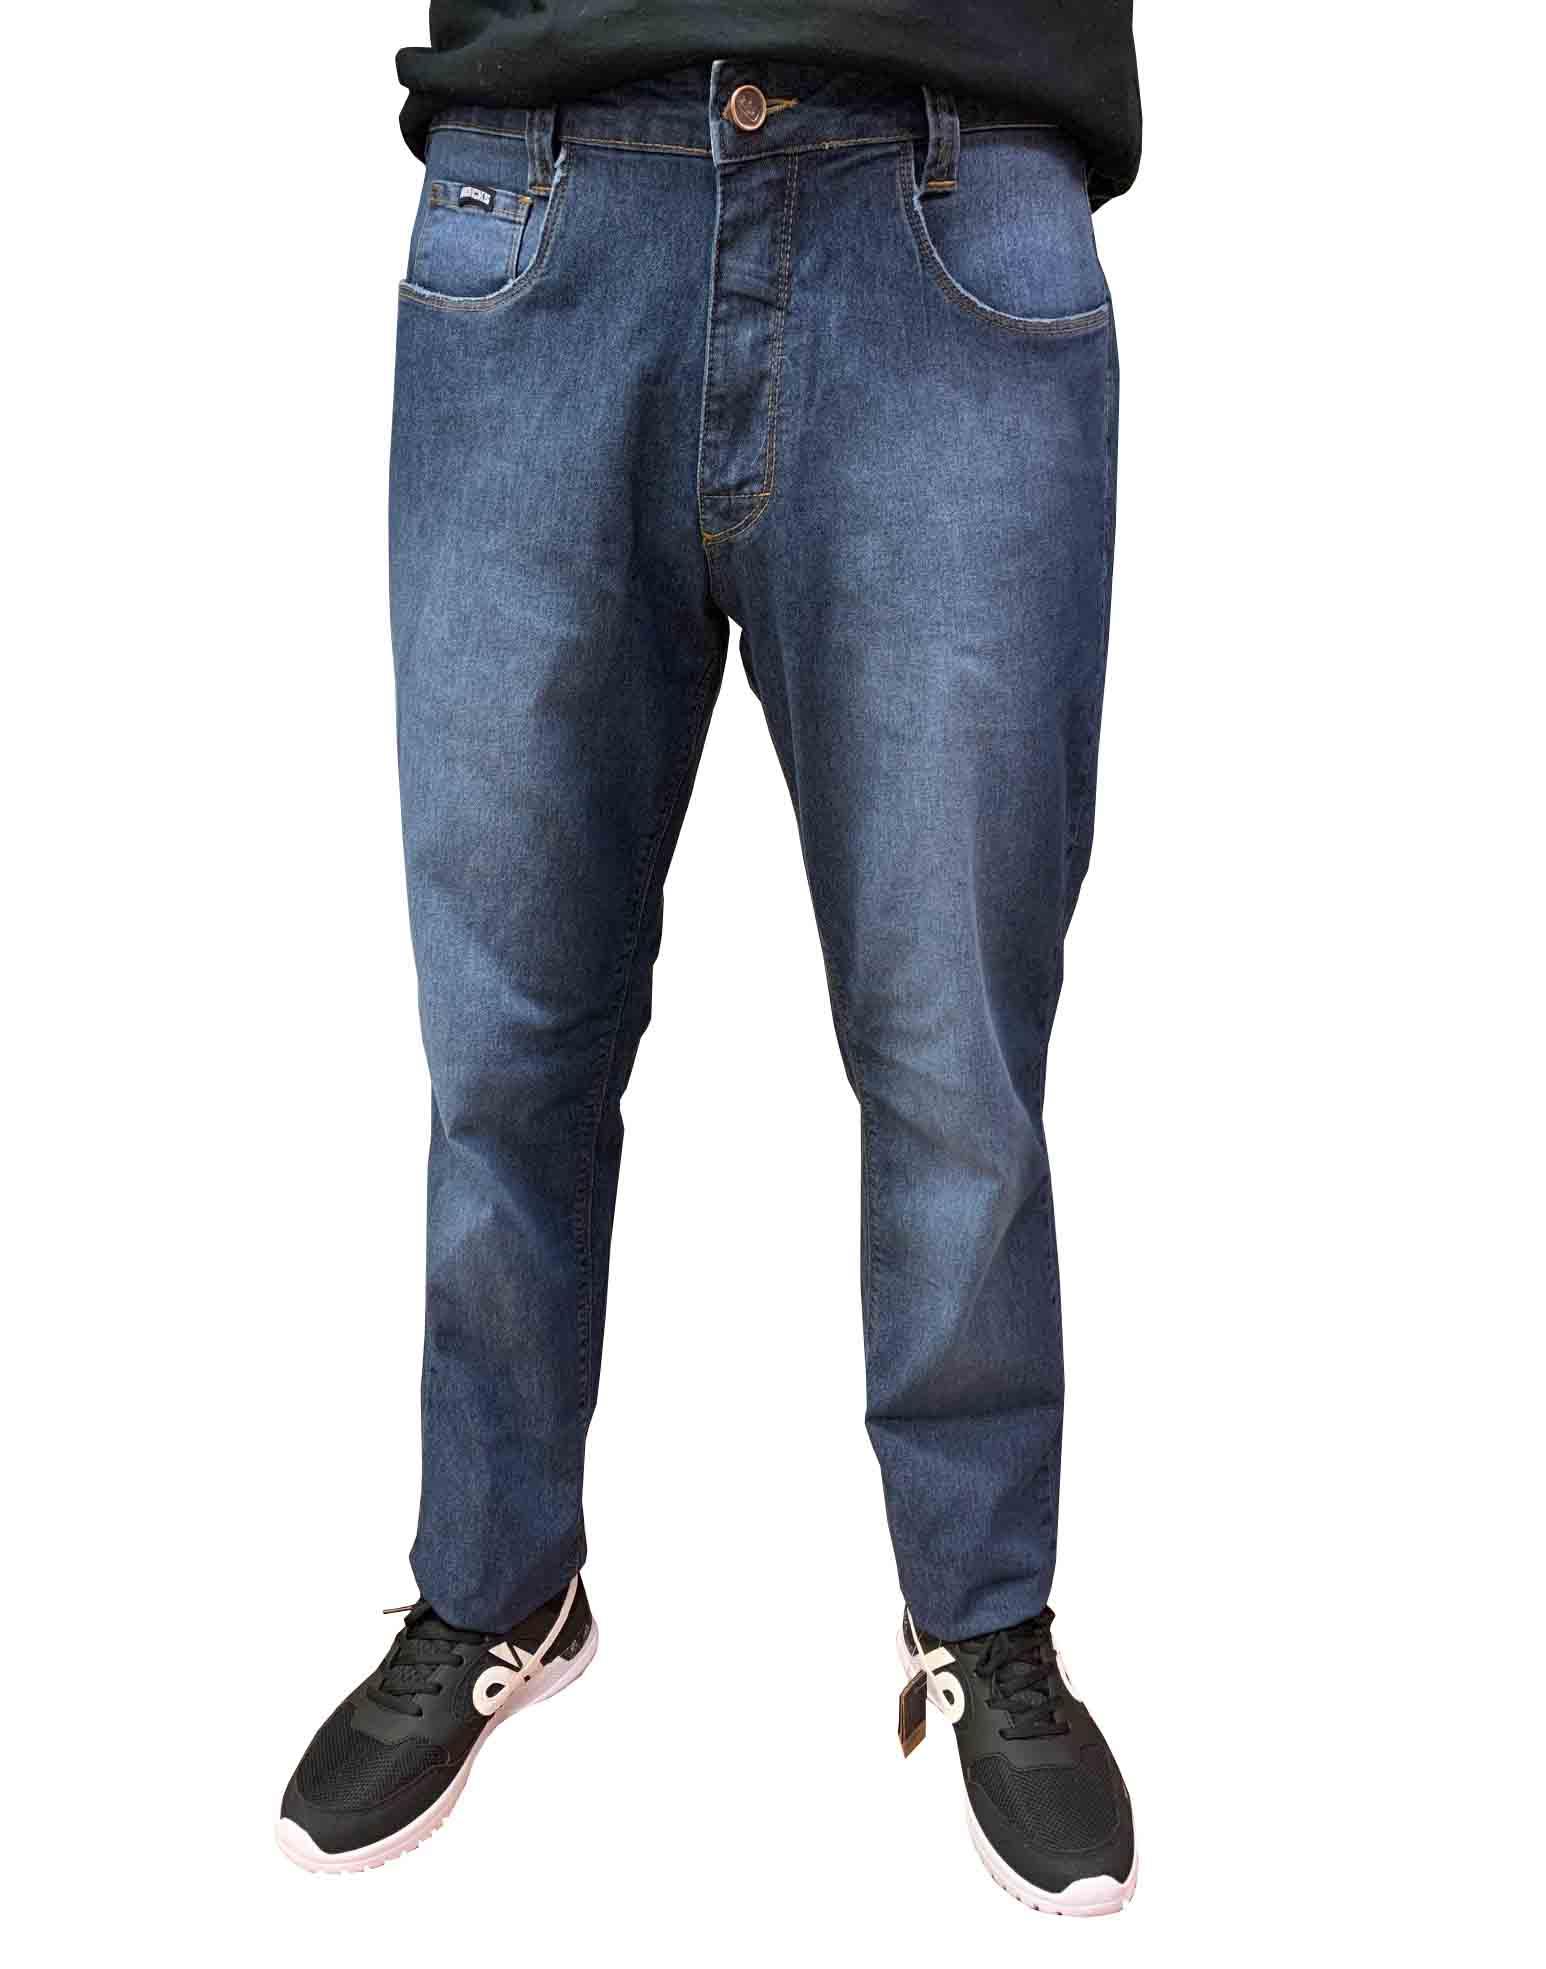 Calça Jeans Hocks 20-811 Masculina